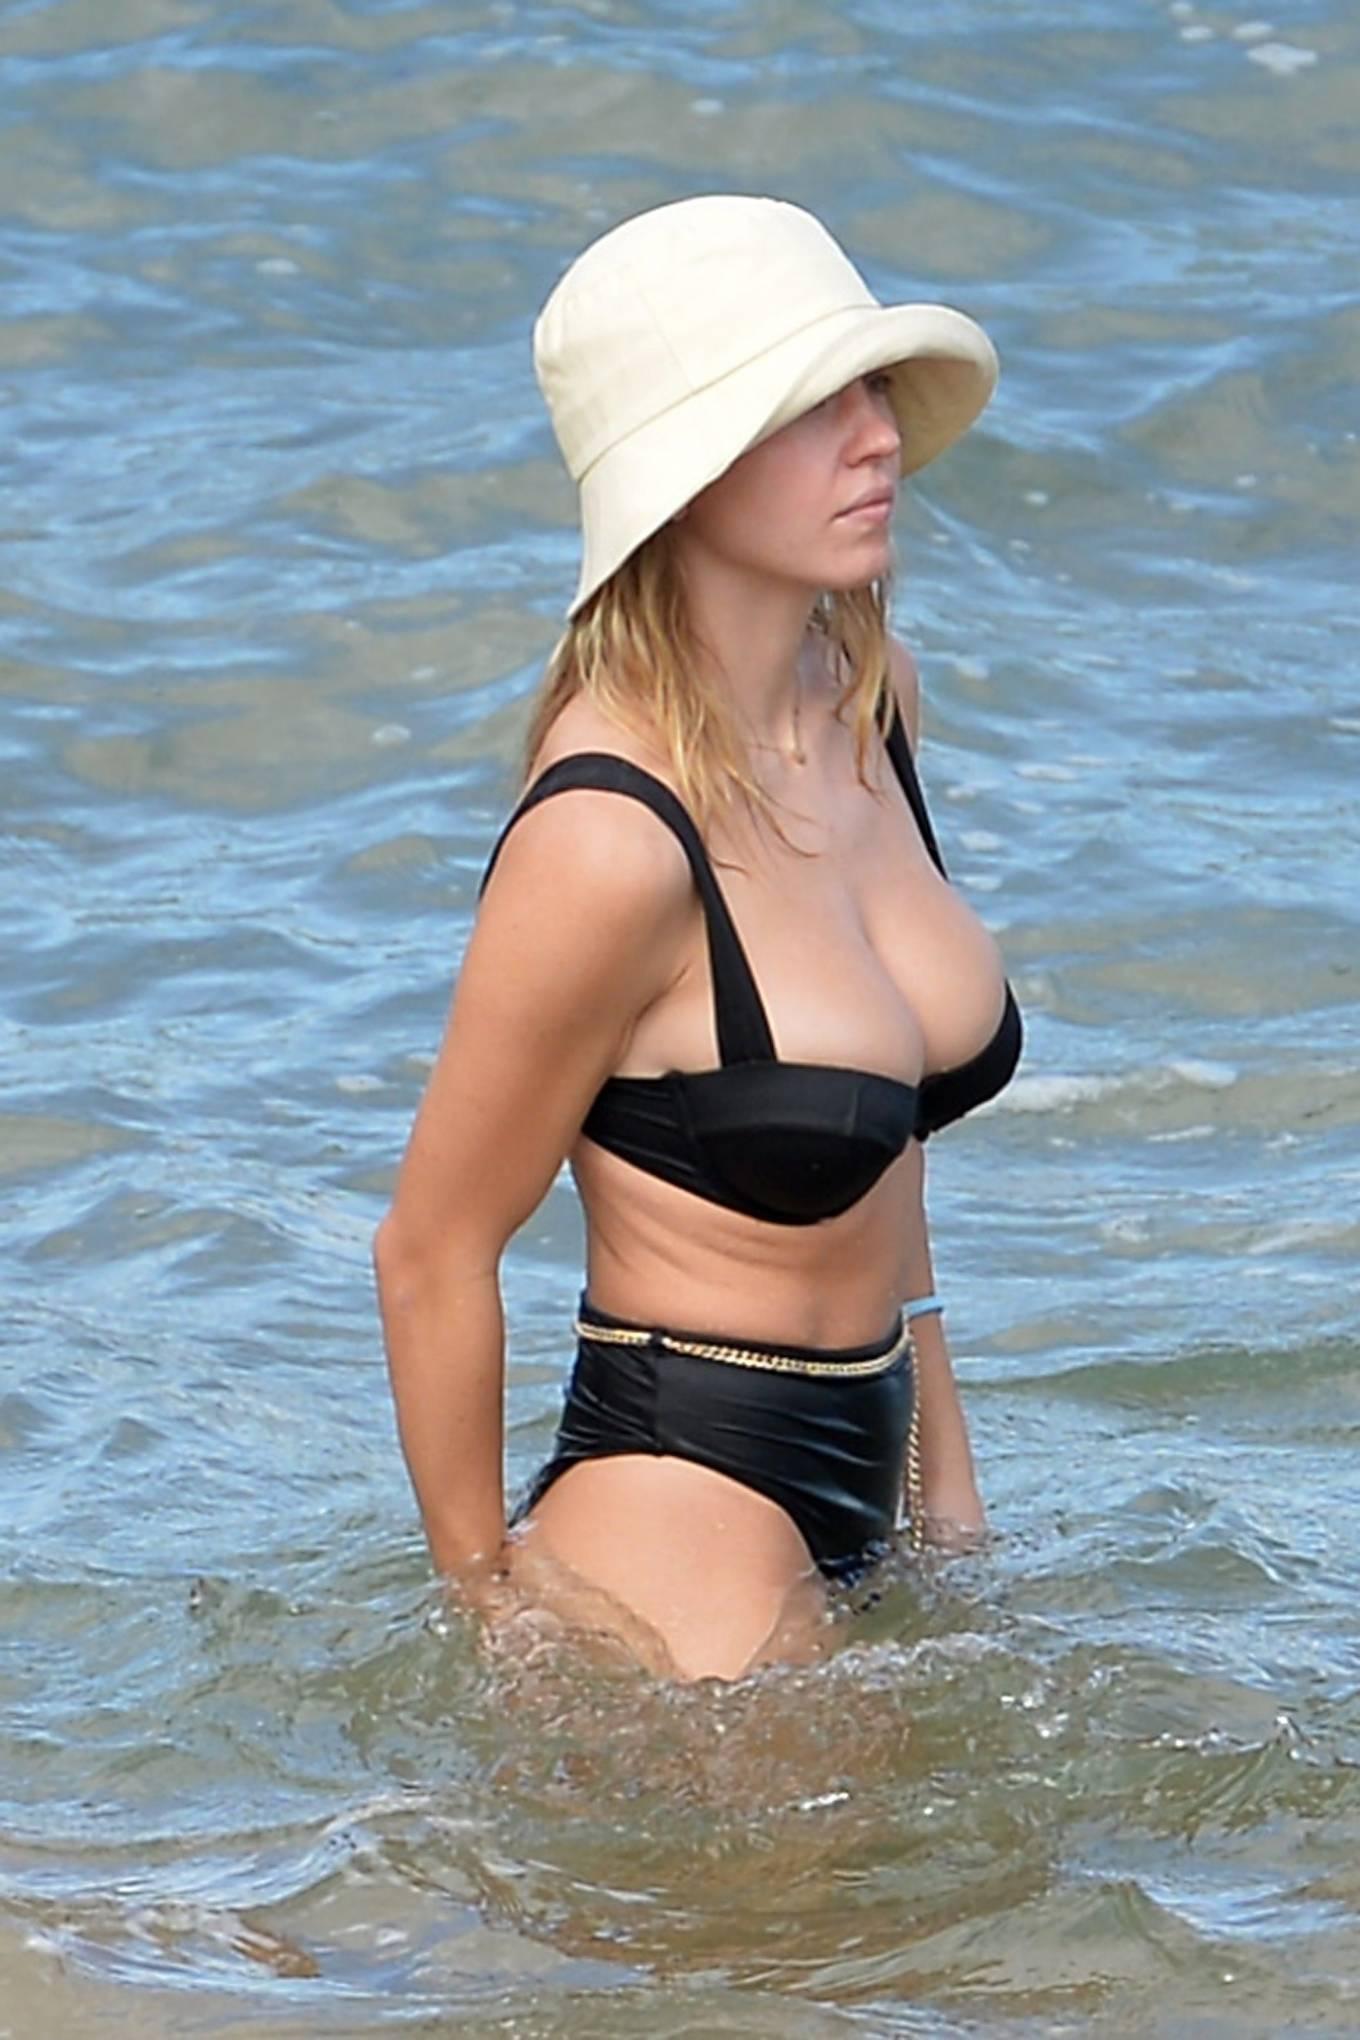 Sydney Sweeney - Seen at a beach in Hawaii